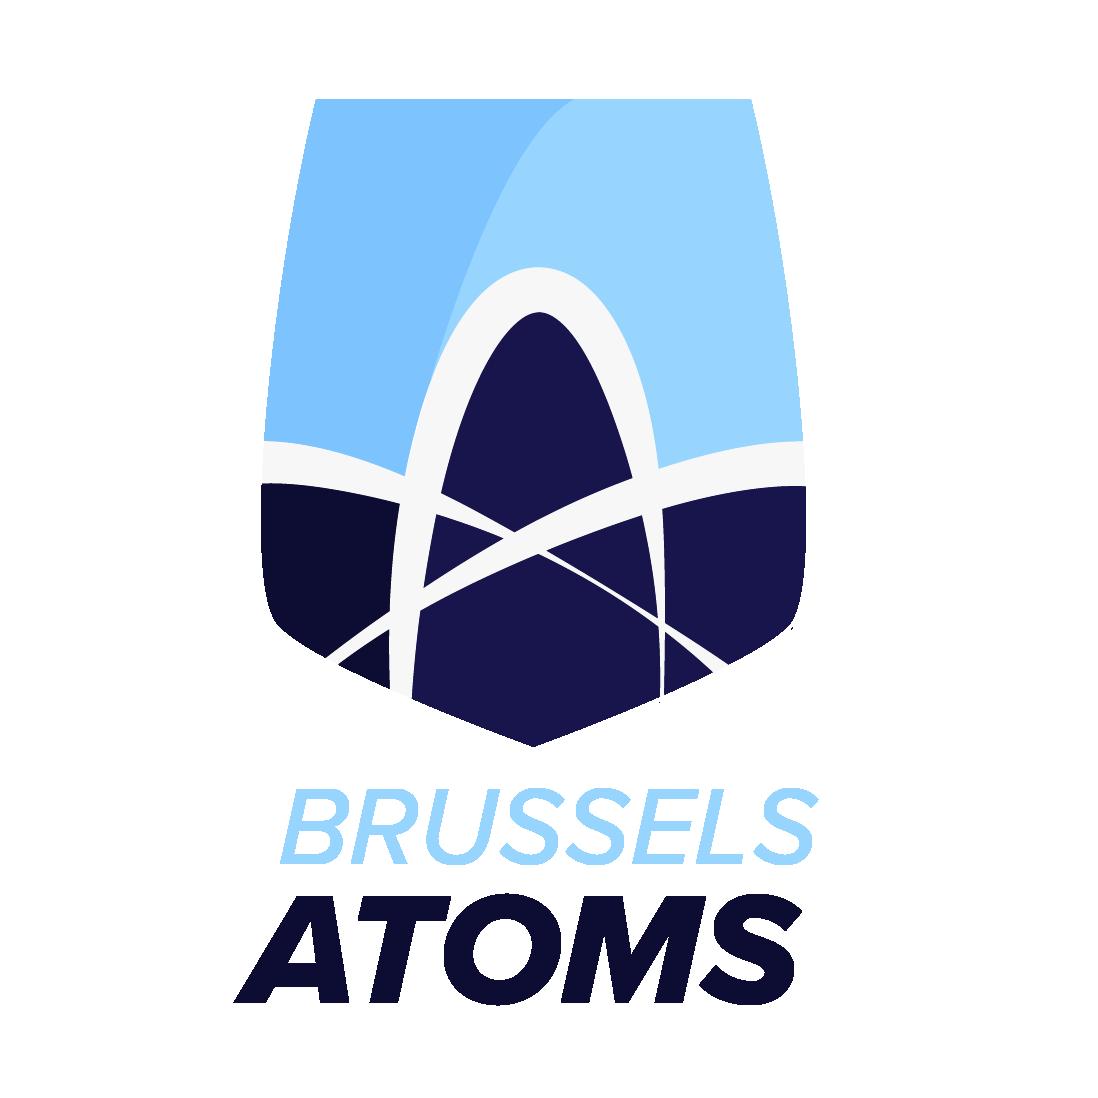 Brussels Atoms